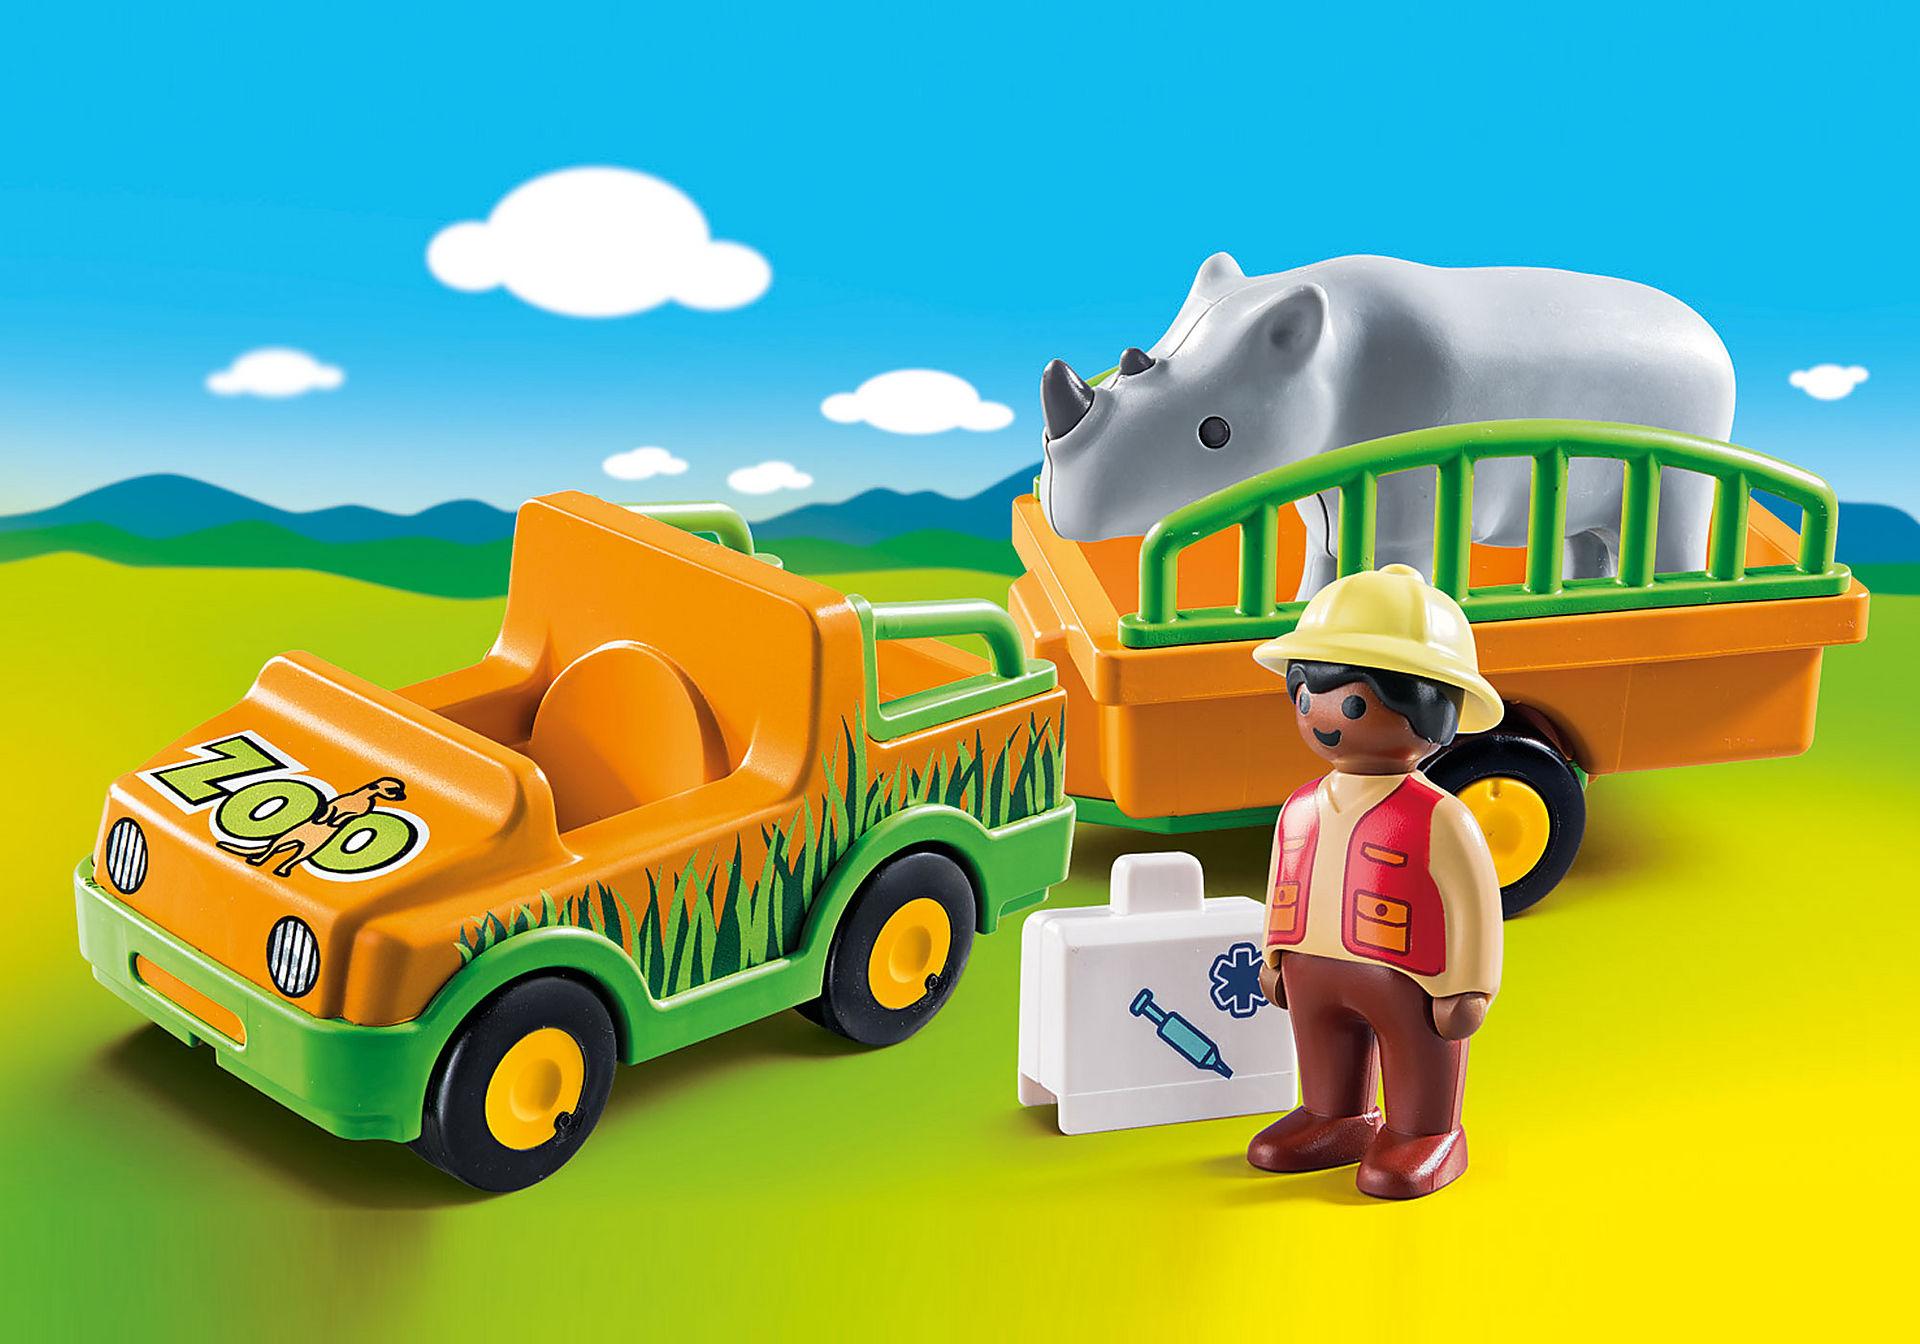 70182 Zoofahrzeug mit Nashorn zoom image1